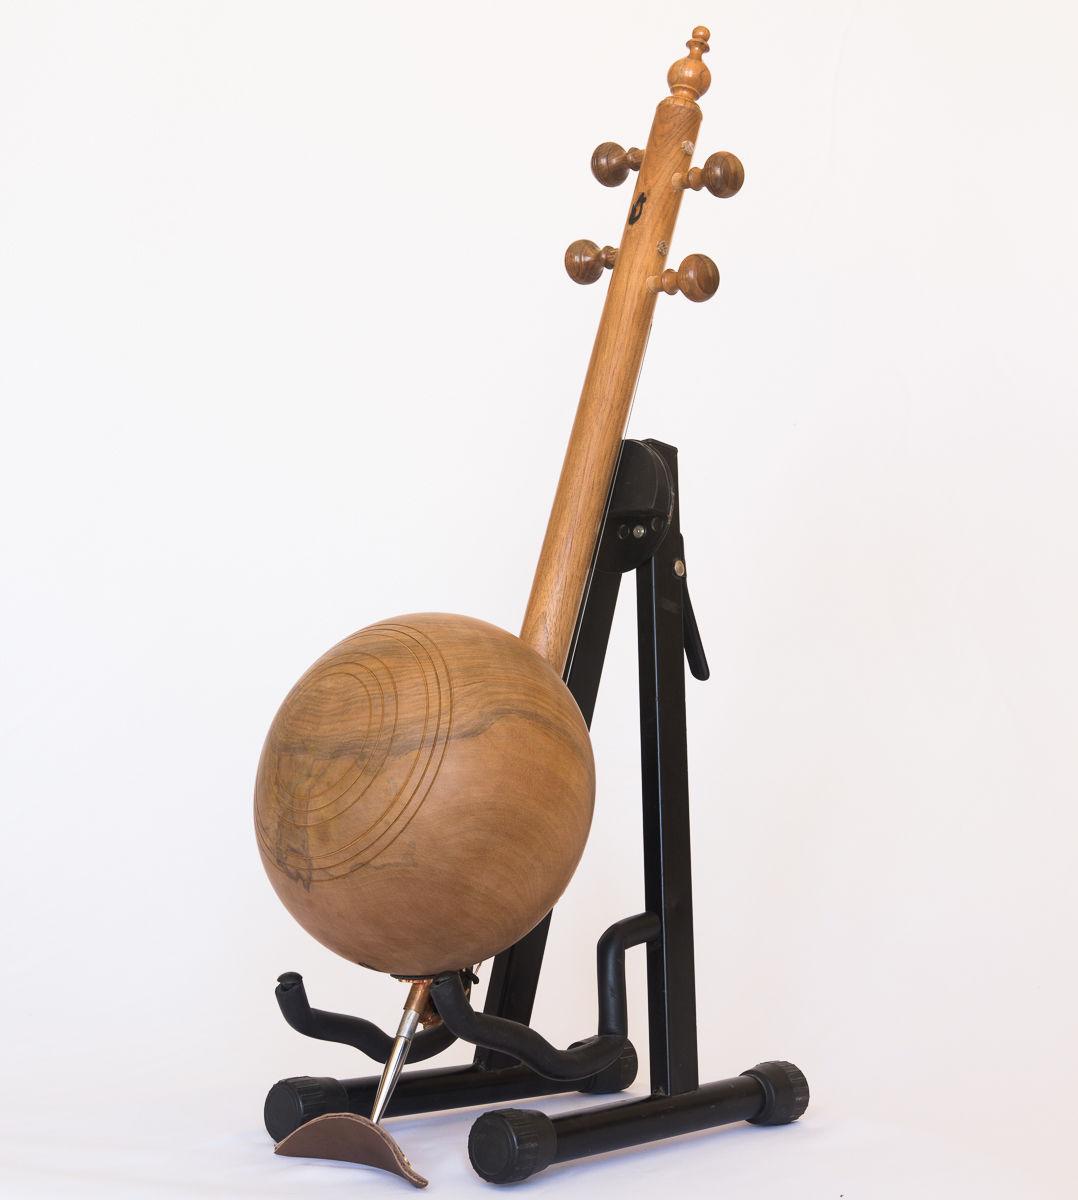 Concert quality Azeri kamanche